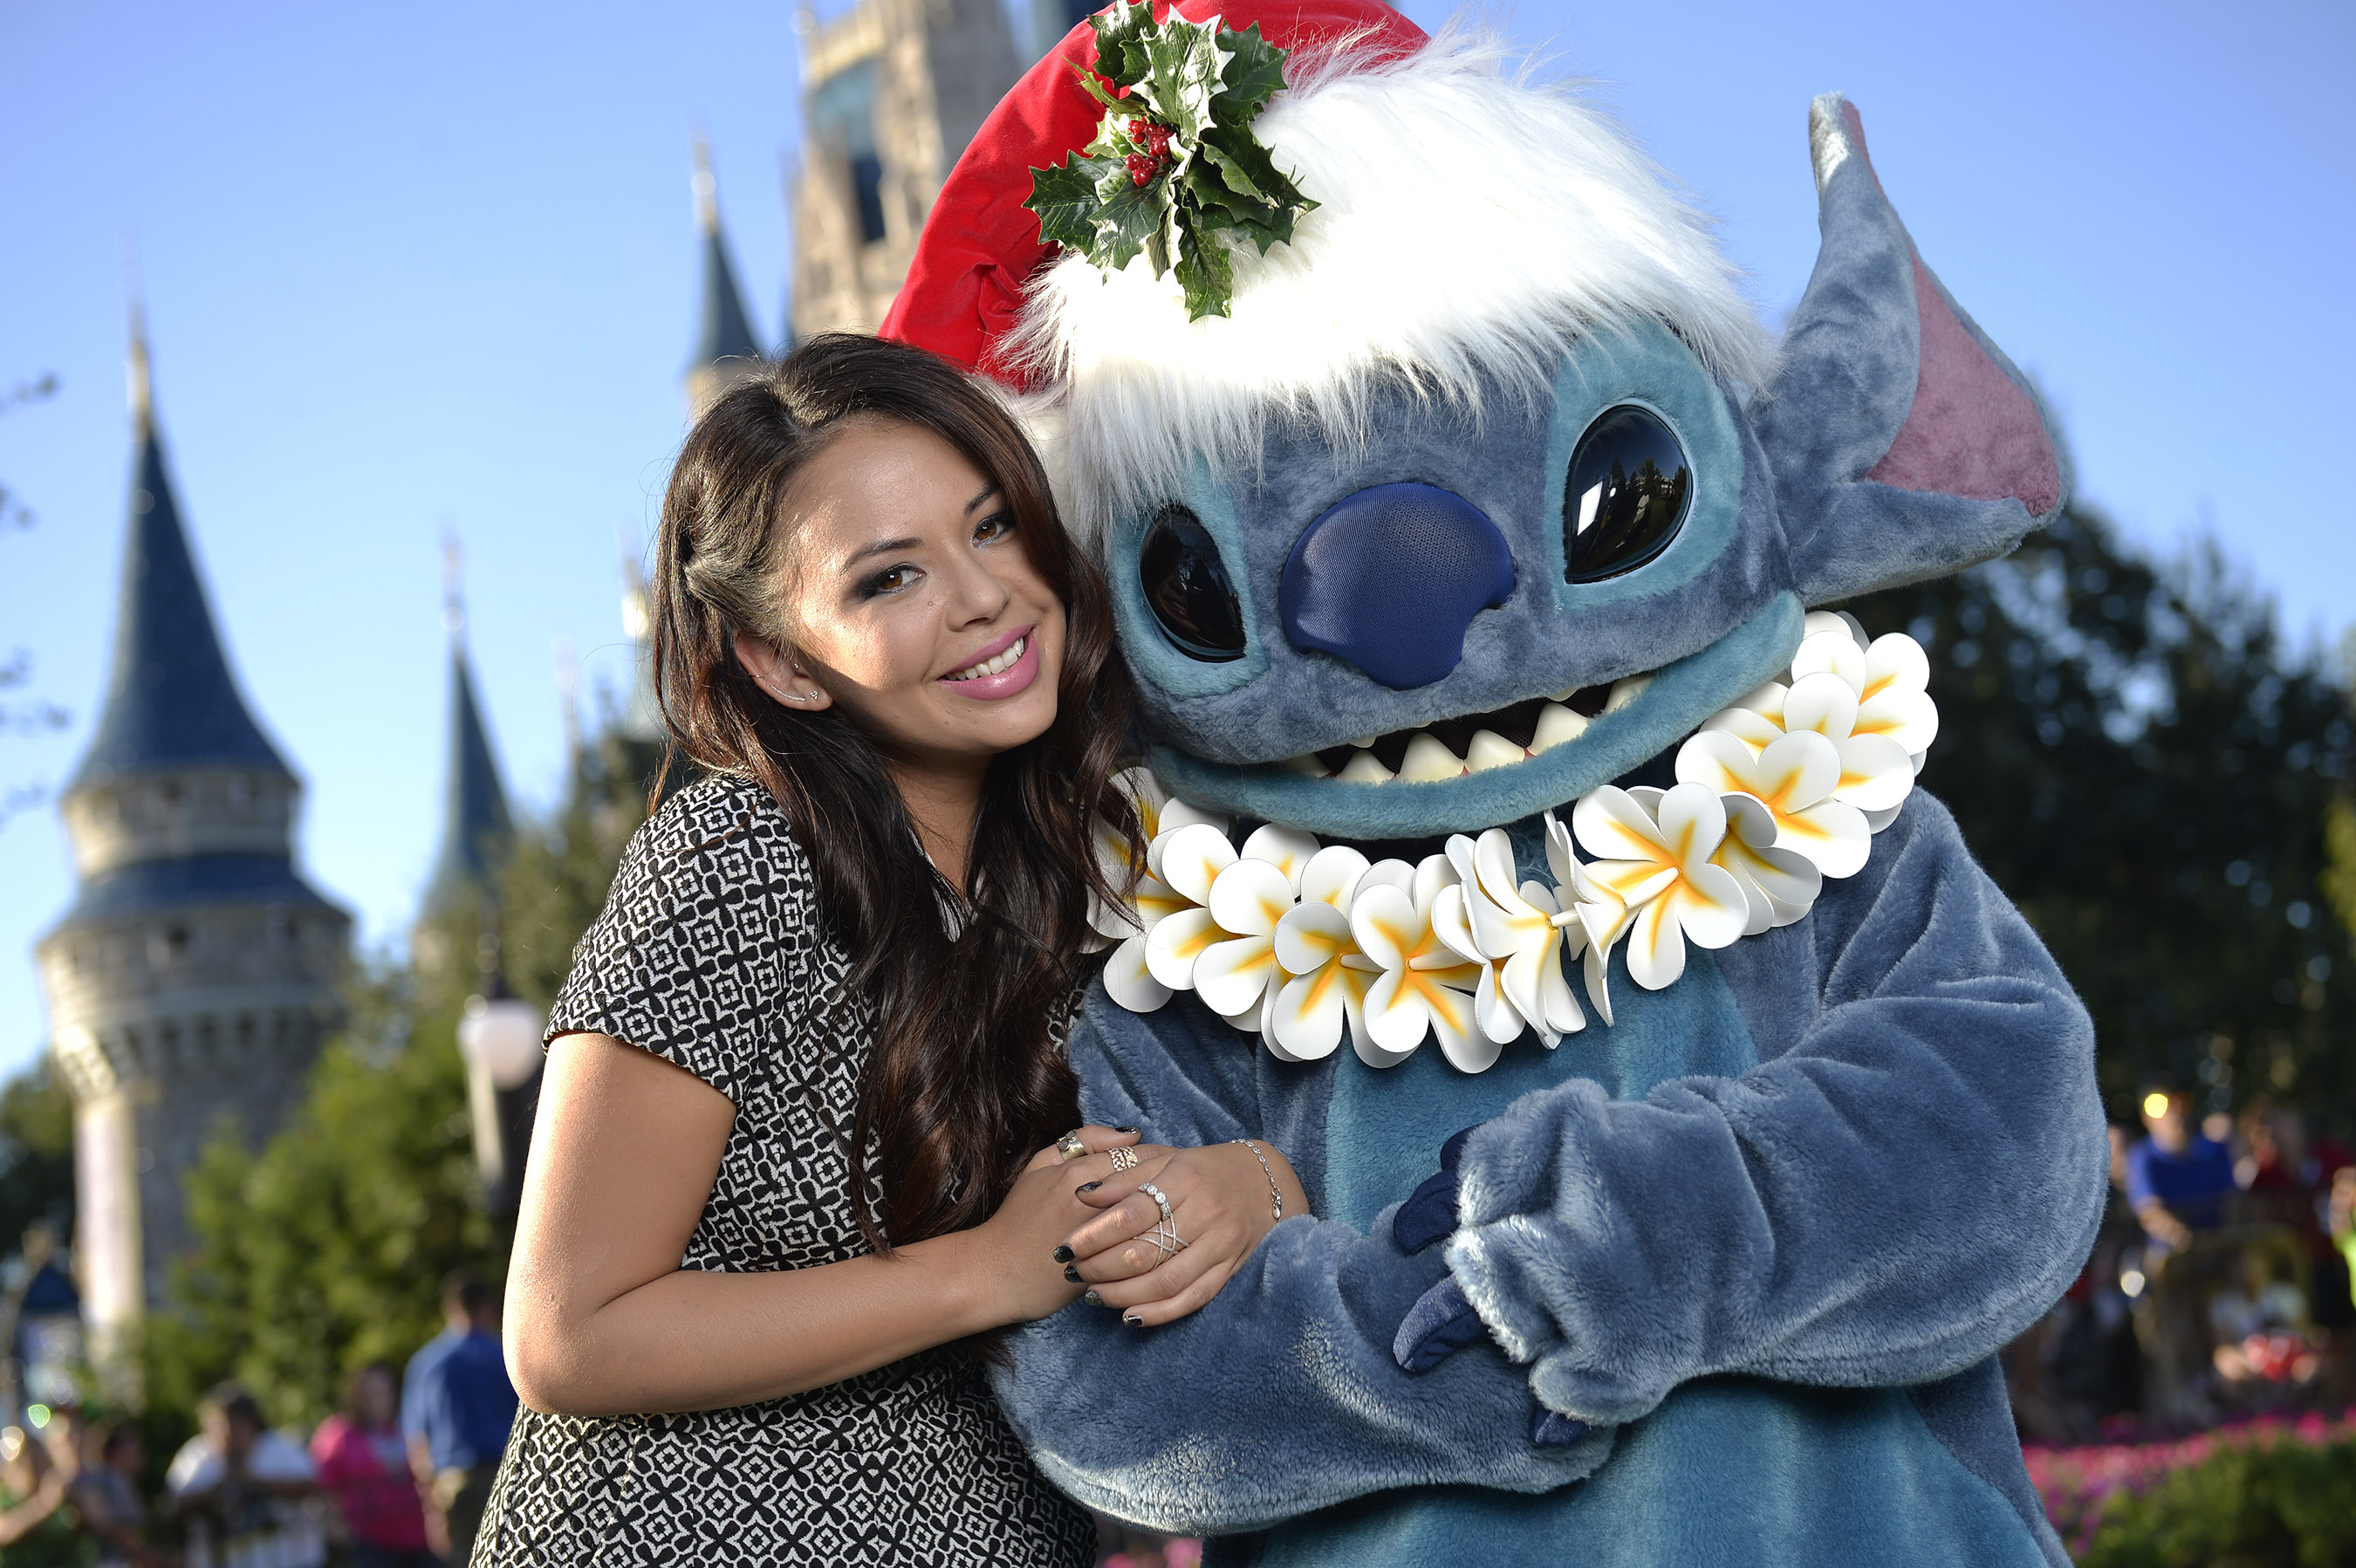 Disney Parks Unforgettable Christmas Celebration performance - Janel Parrish